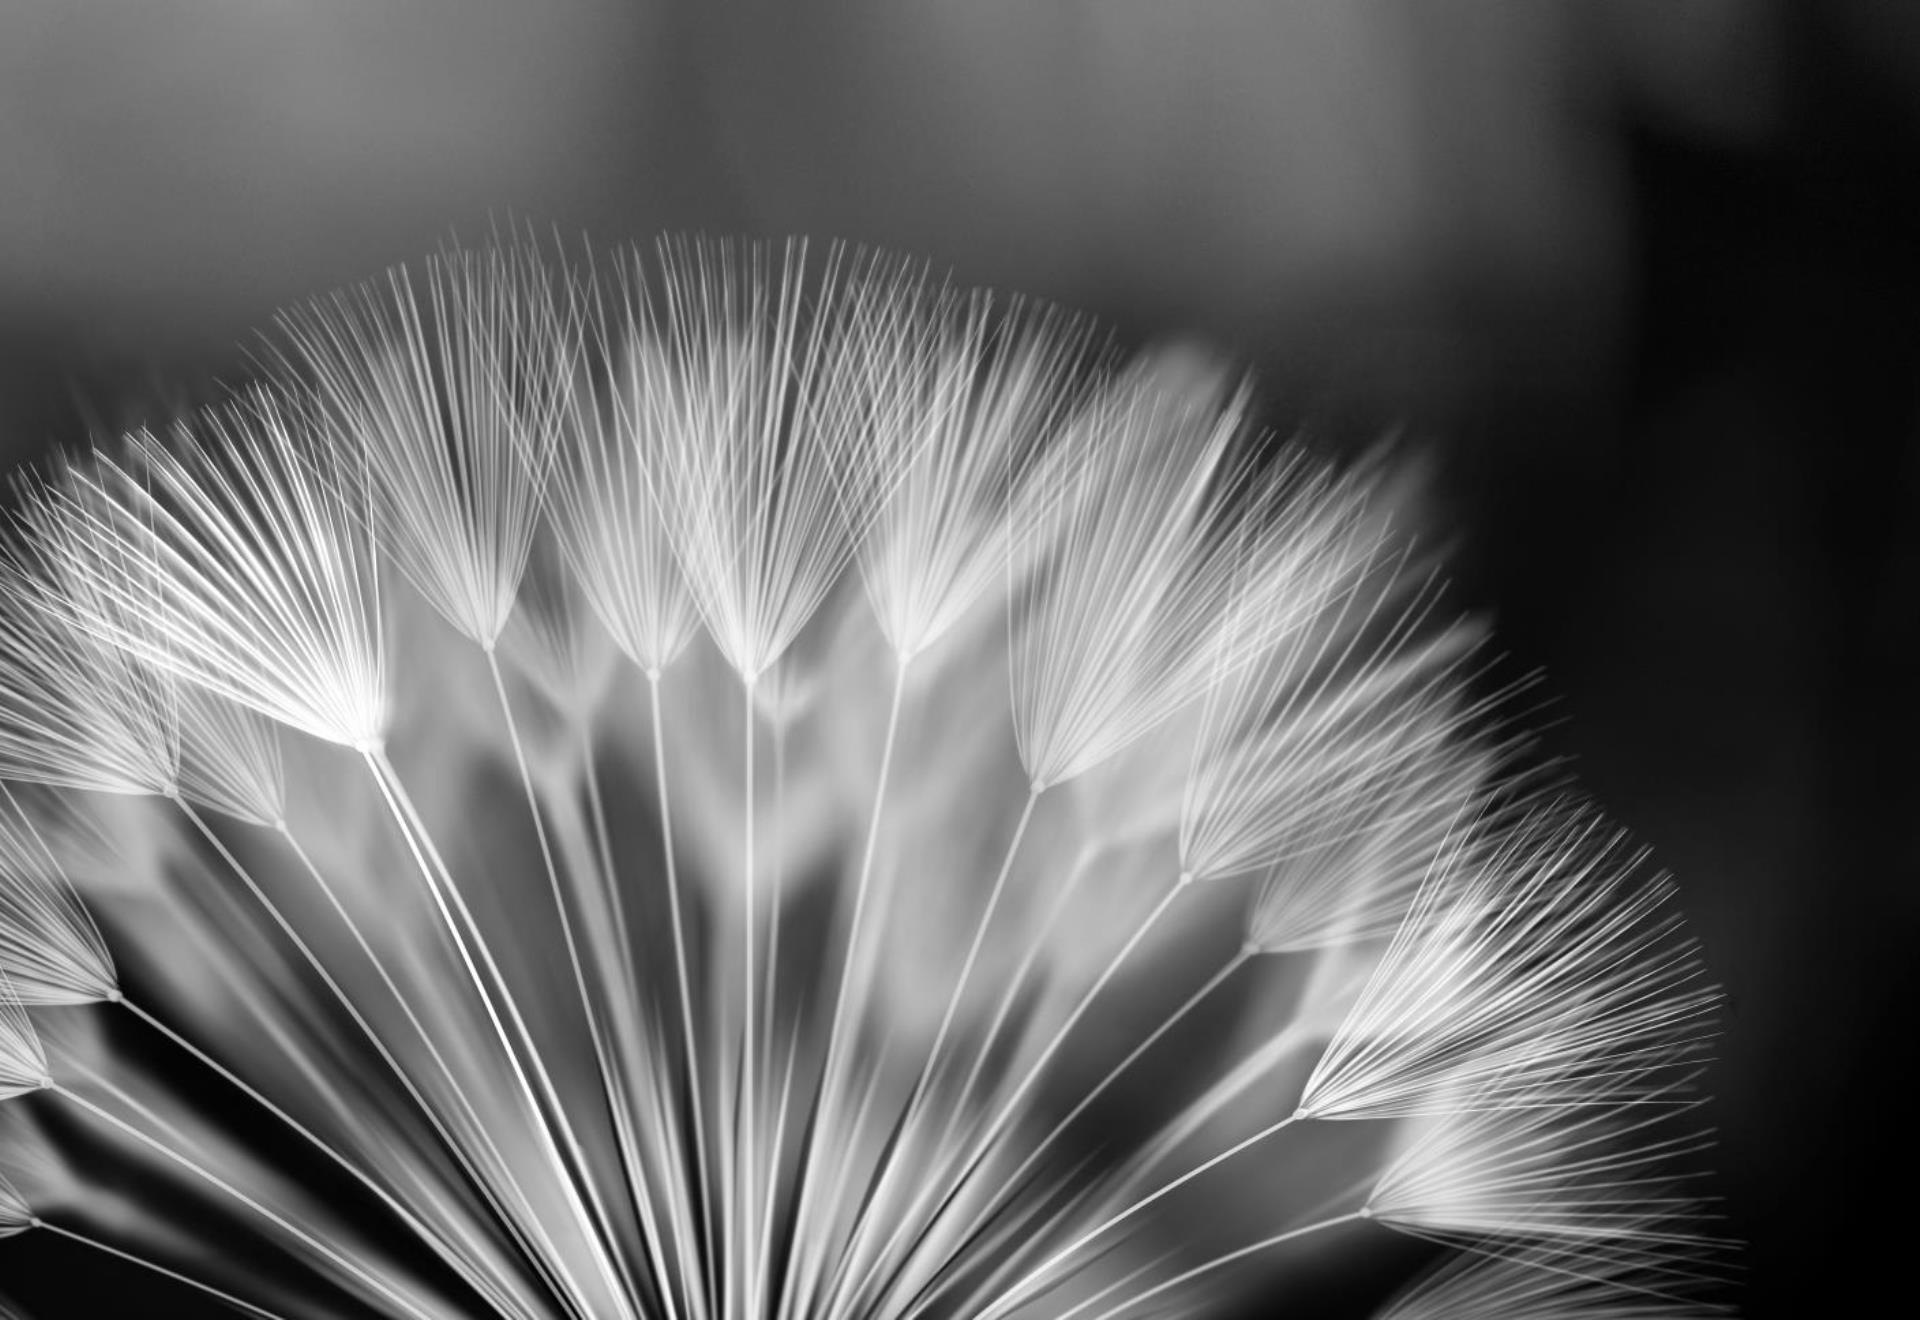 Black and White Dandelion Photo Wallpaper Wall Mural CN 292P eBay 1920x1320